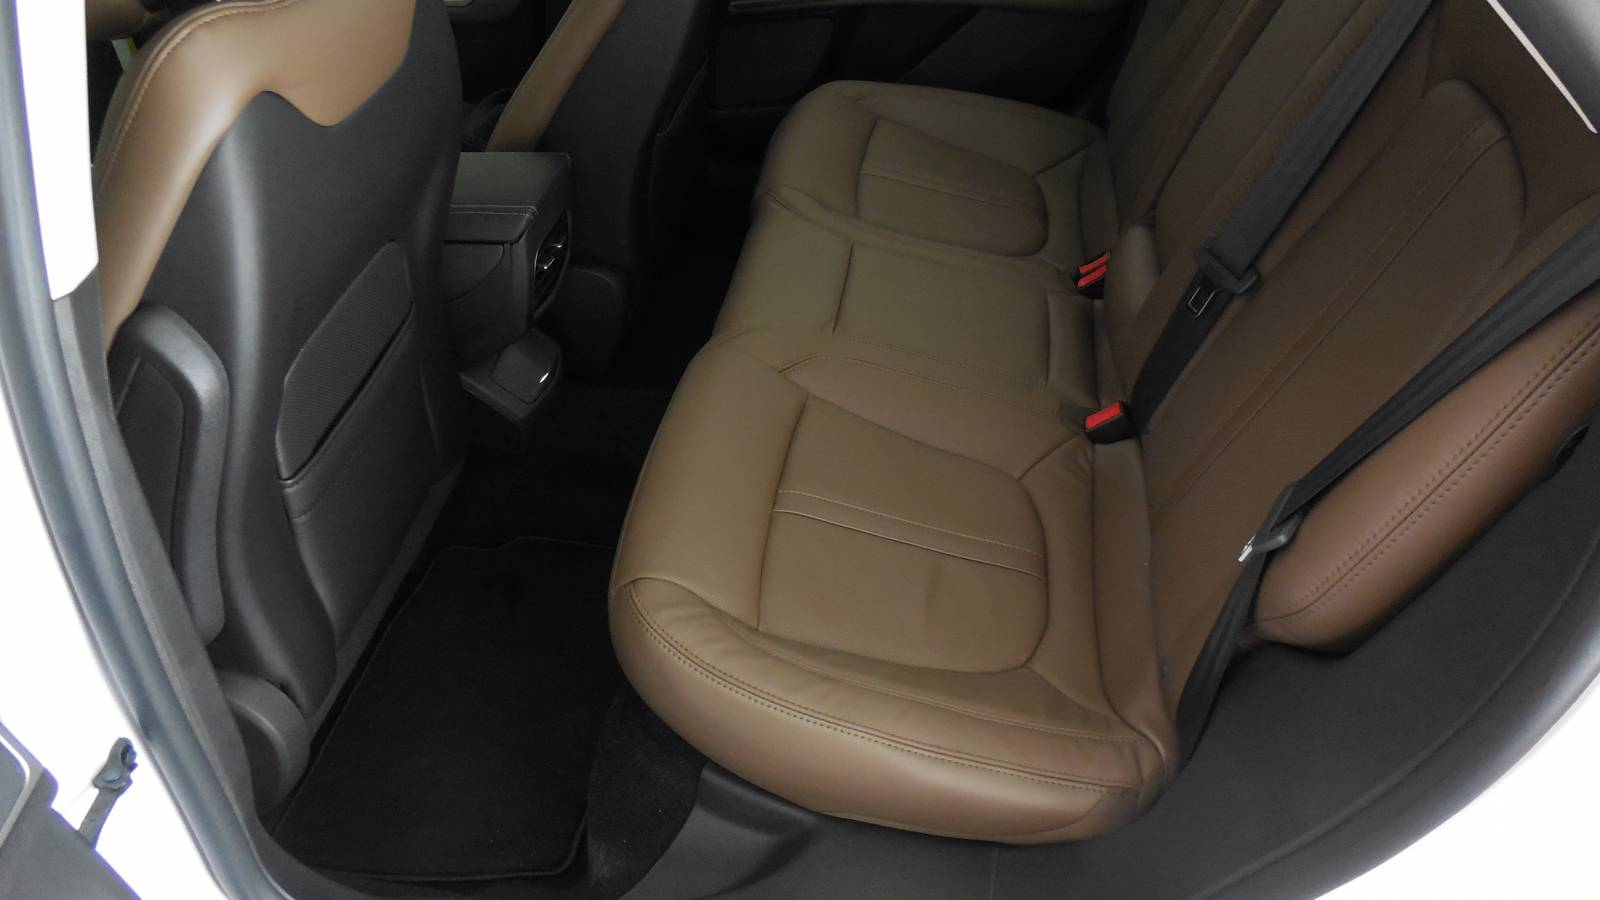 Rear Seats Hazelnut color scheme